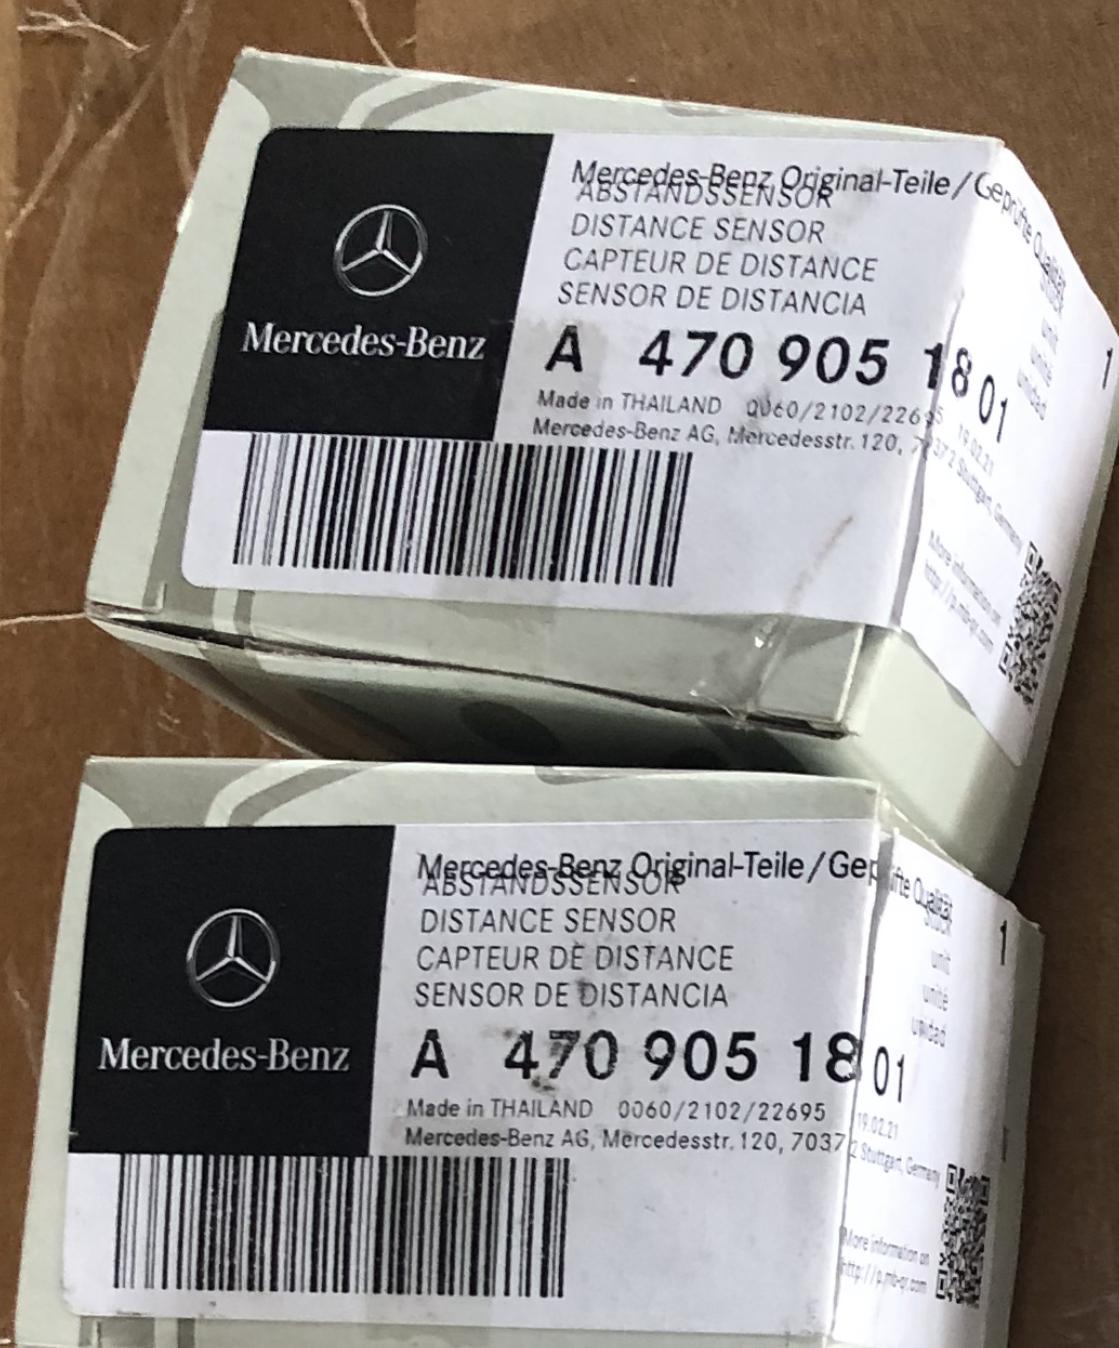 A4709051801 Original Distance Sensor ПАРКТРОНИК  ABSTANDSSENSOR Mercedes Benz